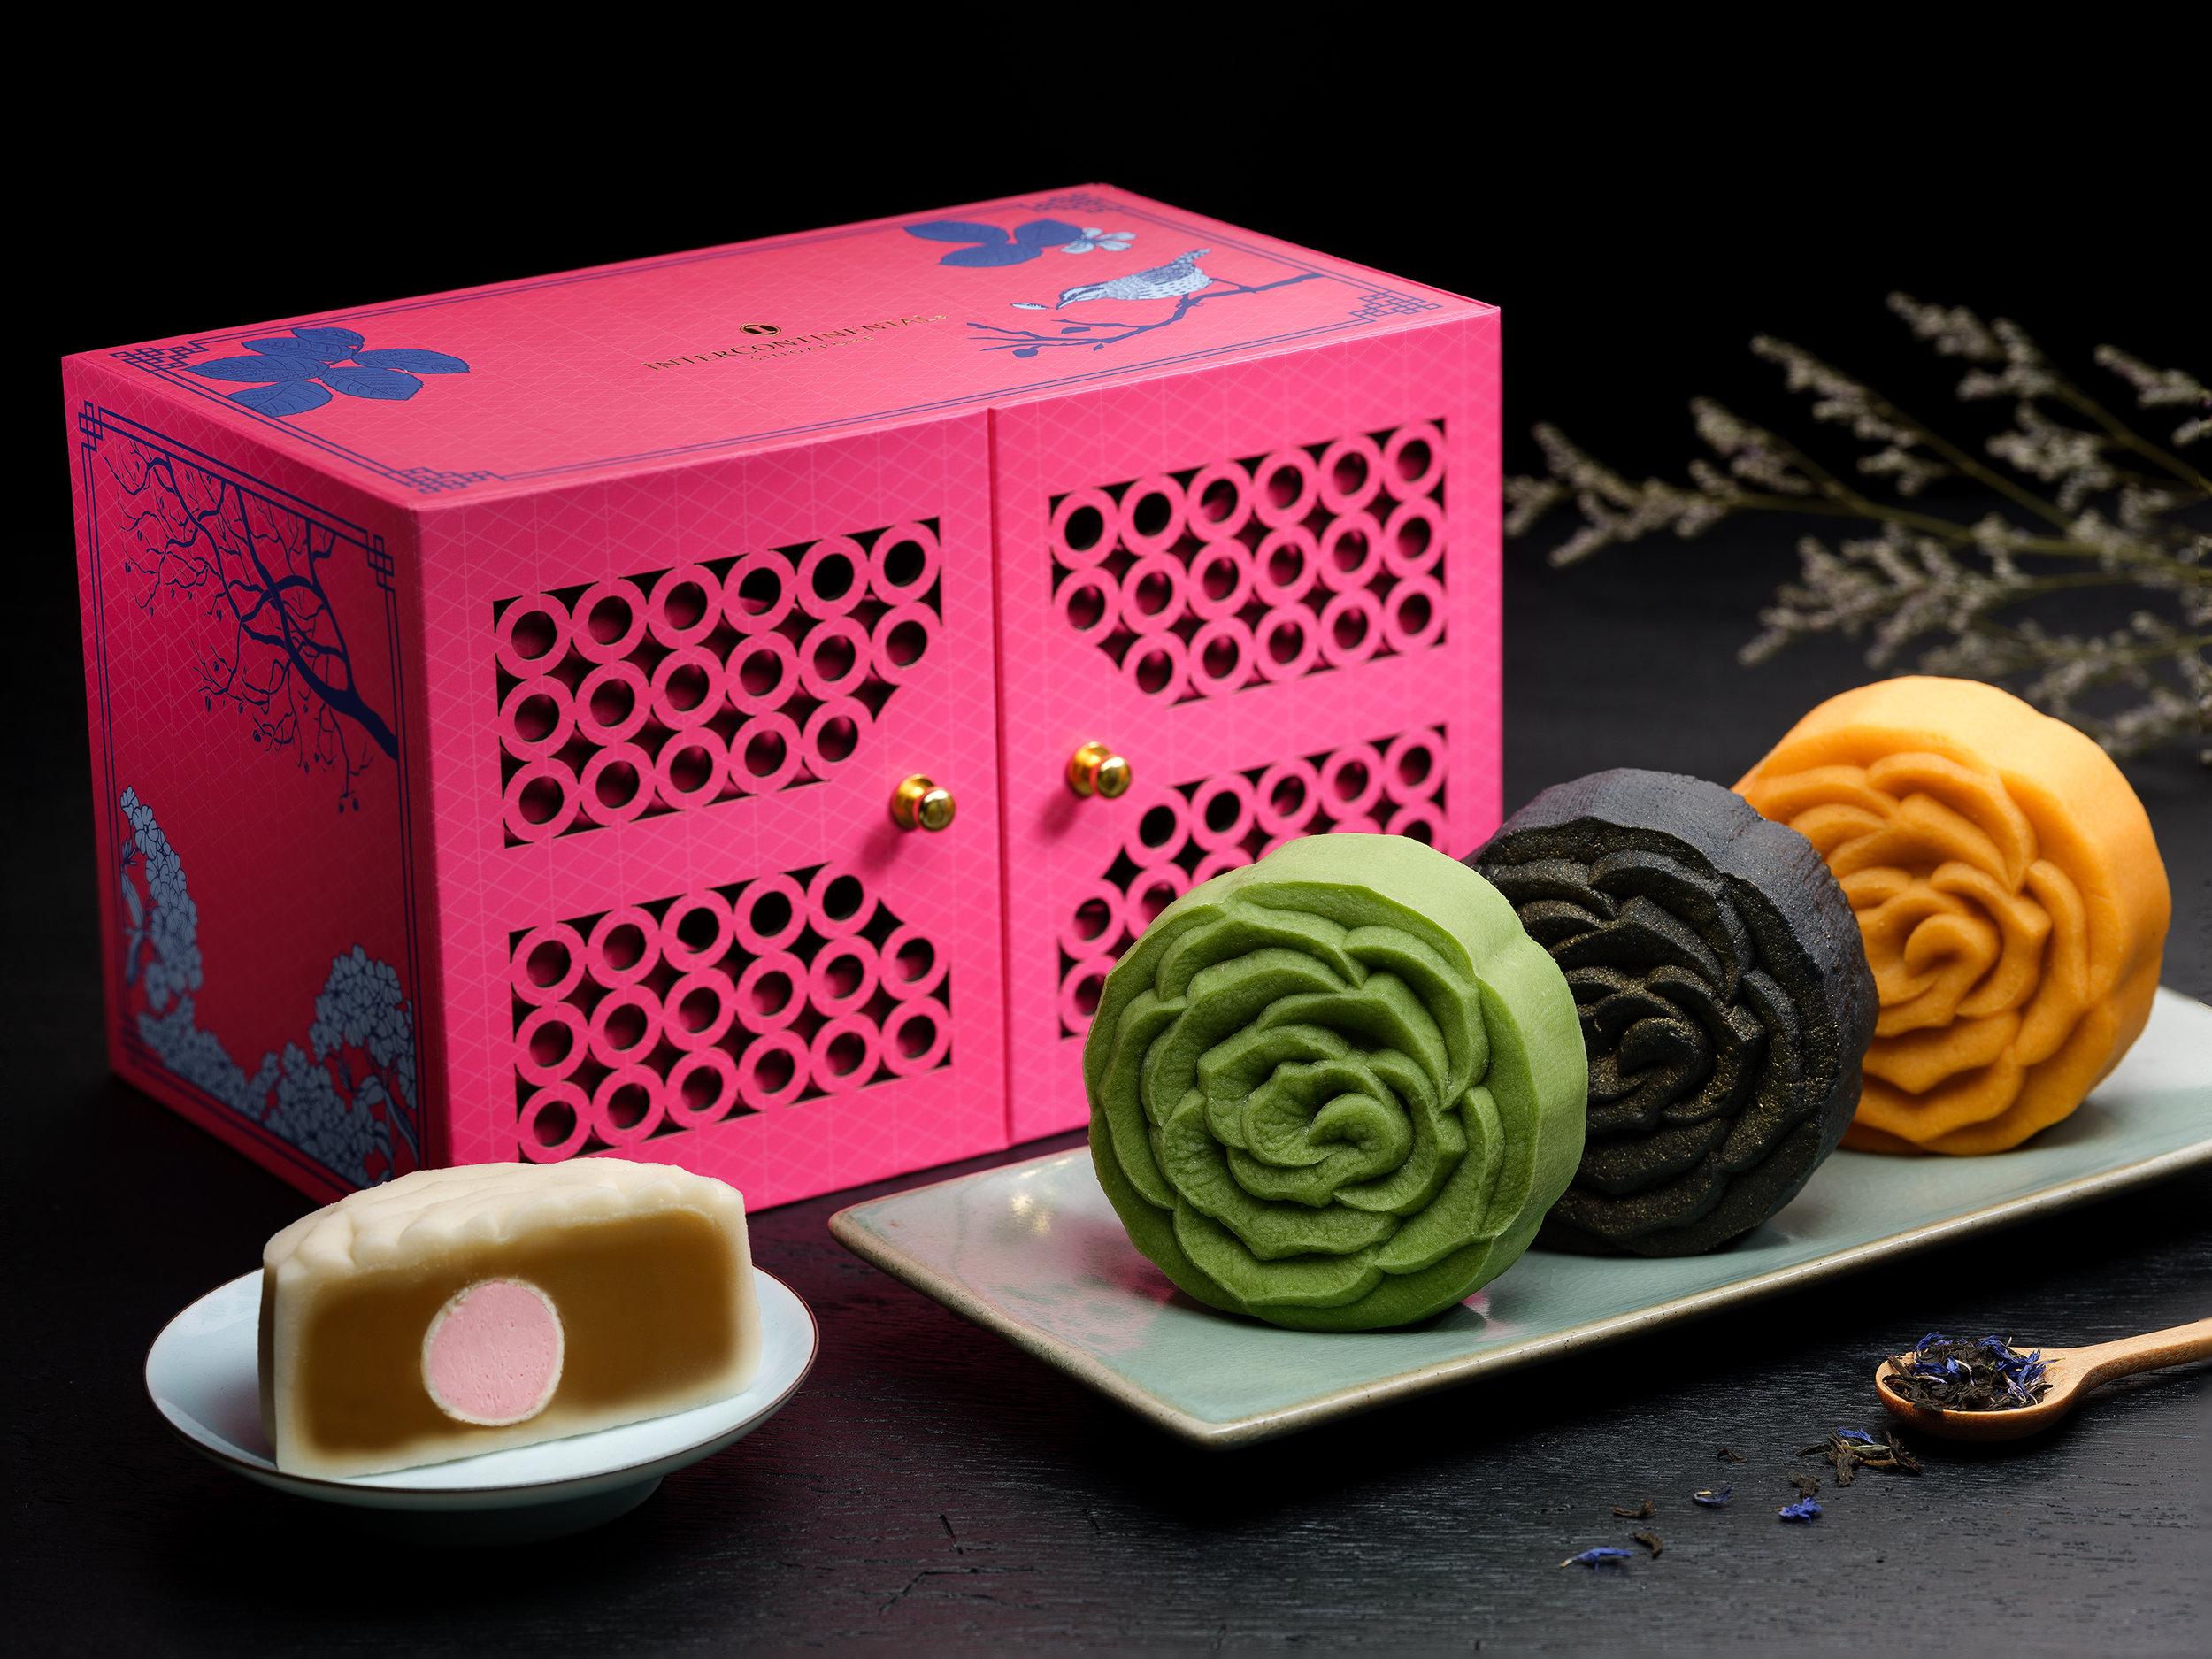 Man Fu Yuan_Snowskin Mooncake-Tea Collection.jpg